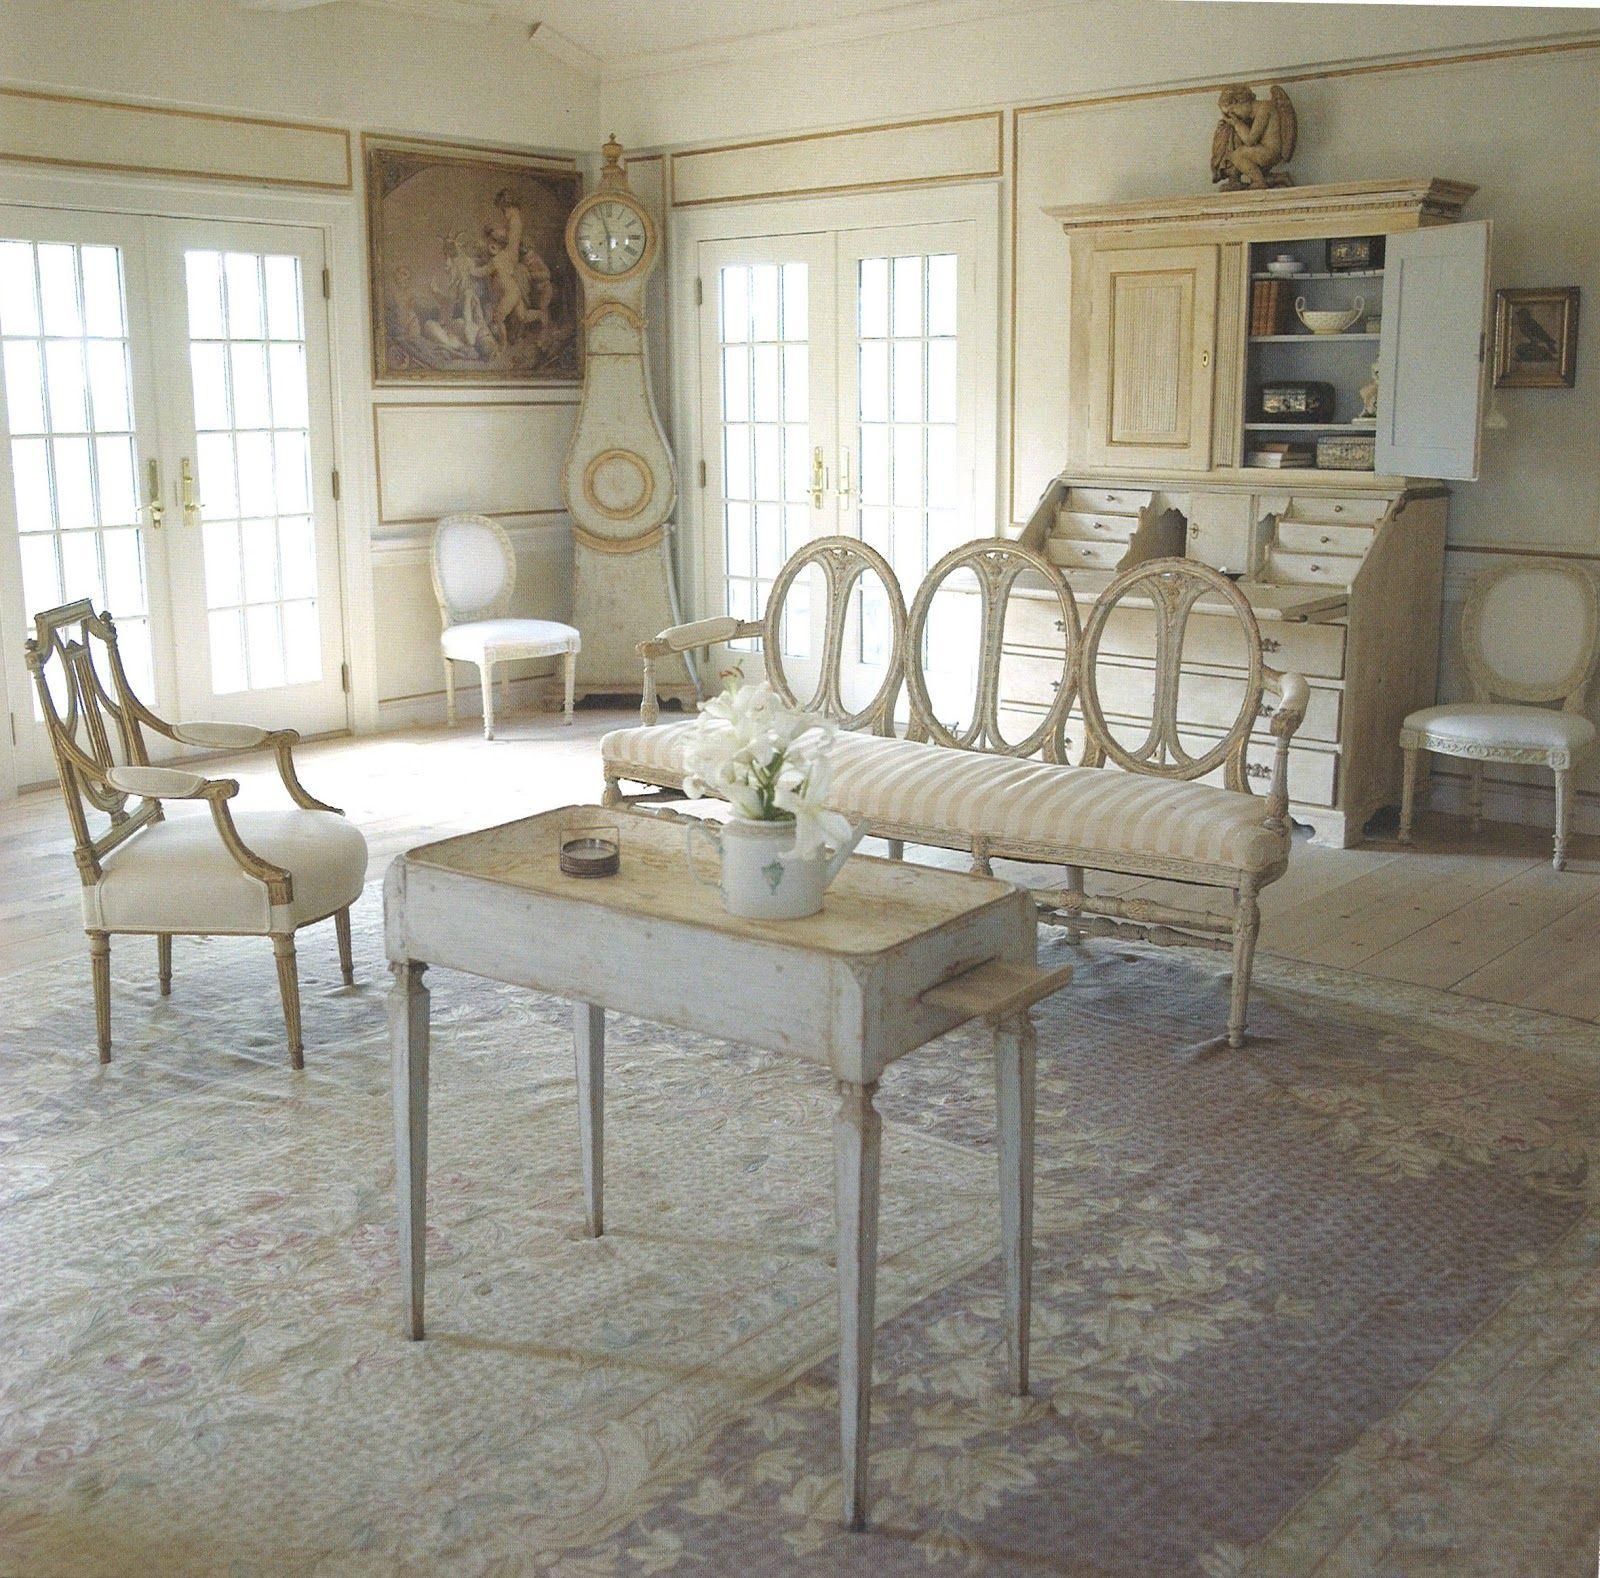 Furniture Furnishings: Henhurst Interiors: A Few Of My Favorite Things